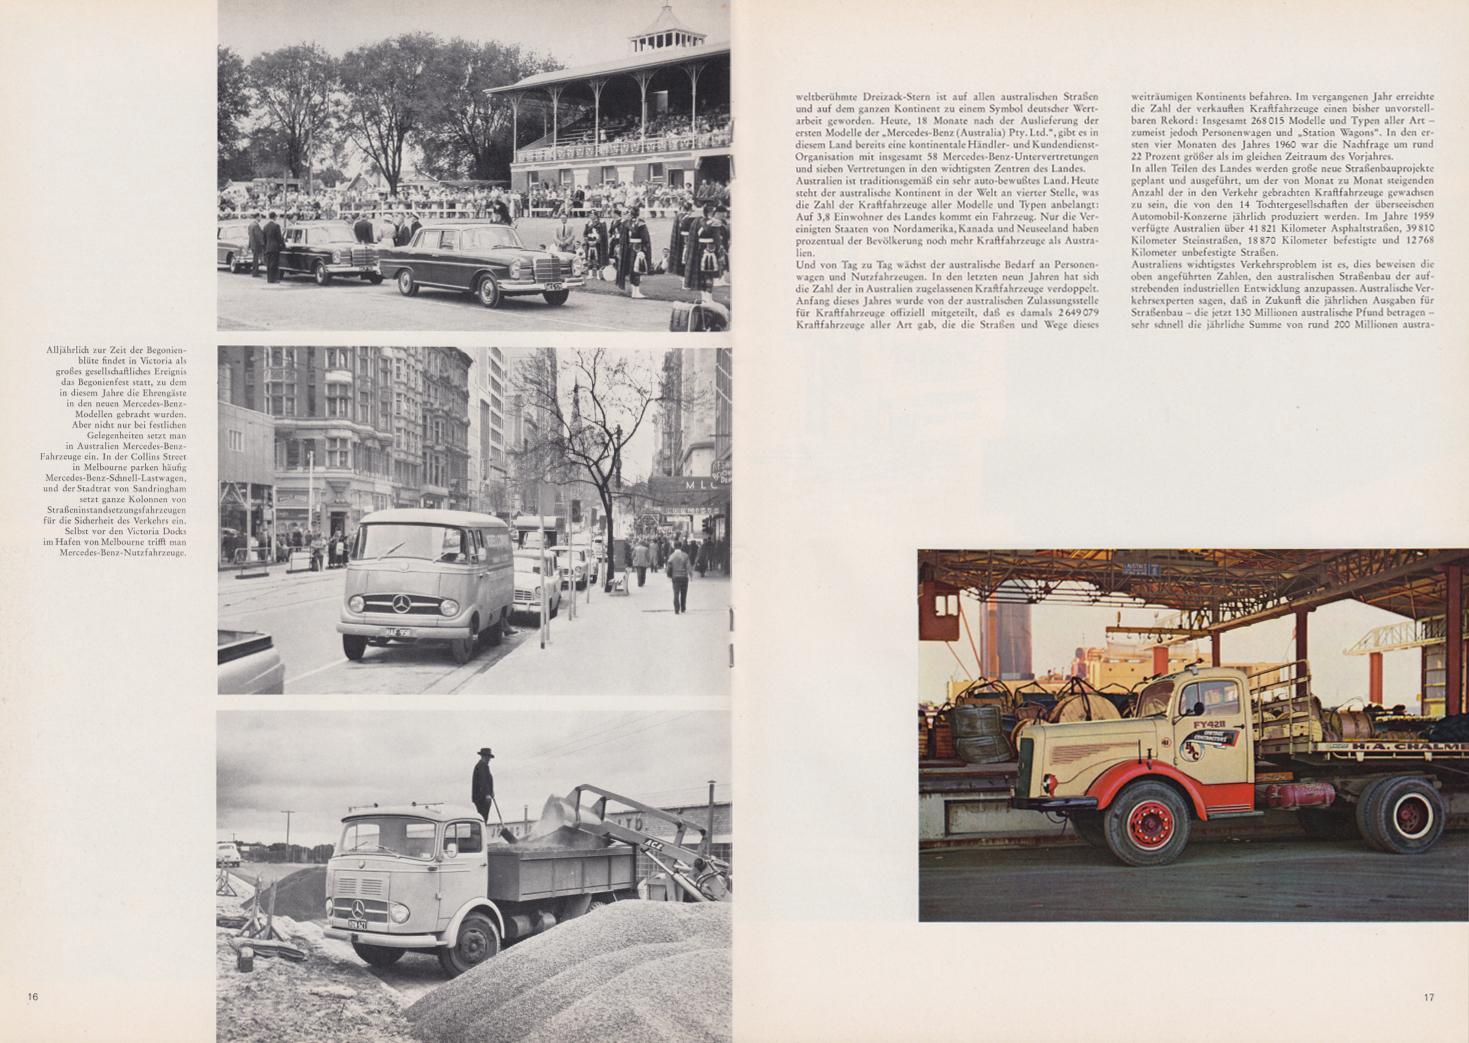 (REVISTA): Periódico In aller welt n.º 44 - Mercedes-Benz no mundo - 1960 - multilingue 009